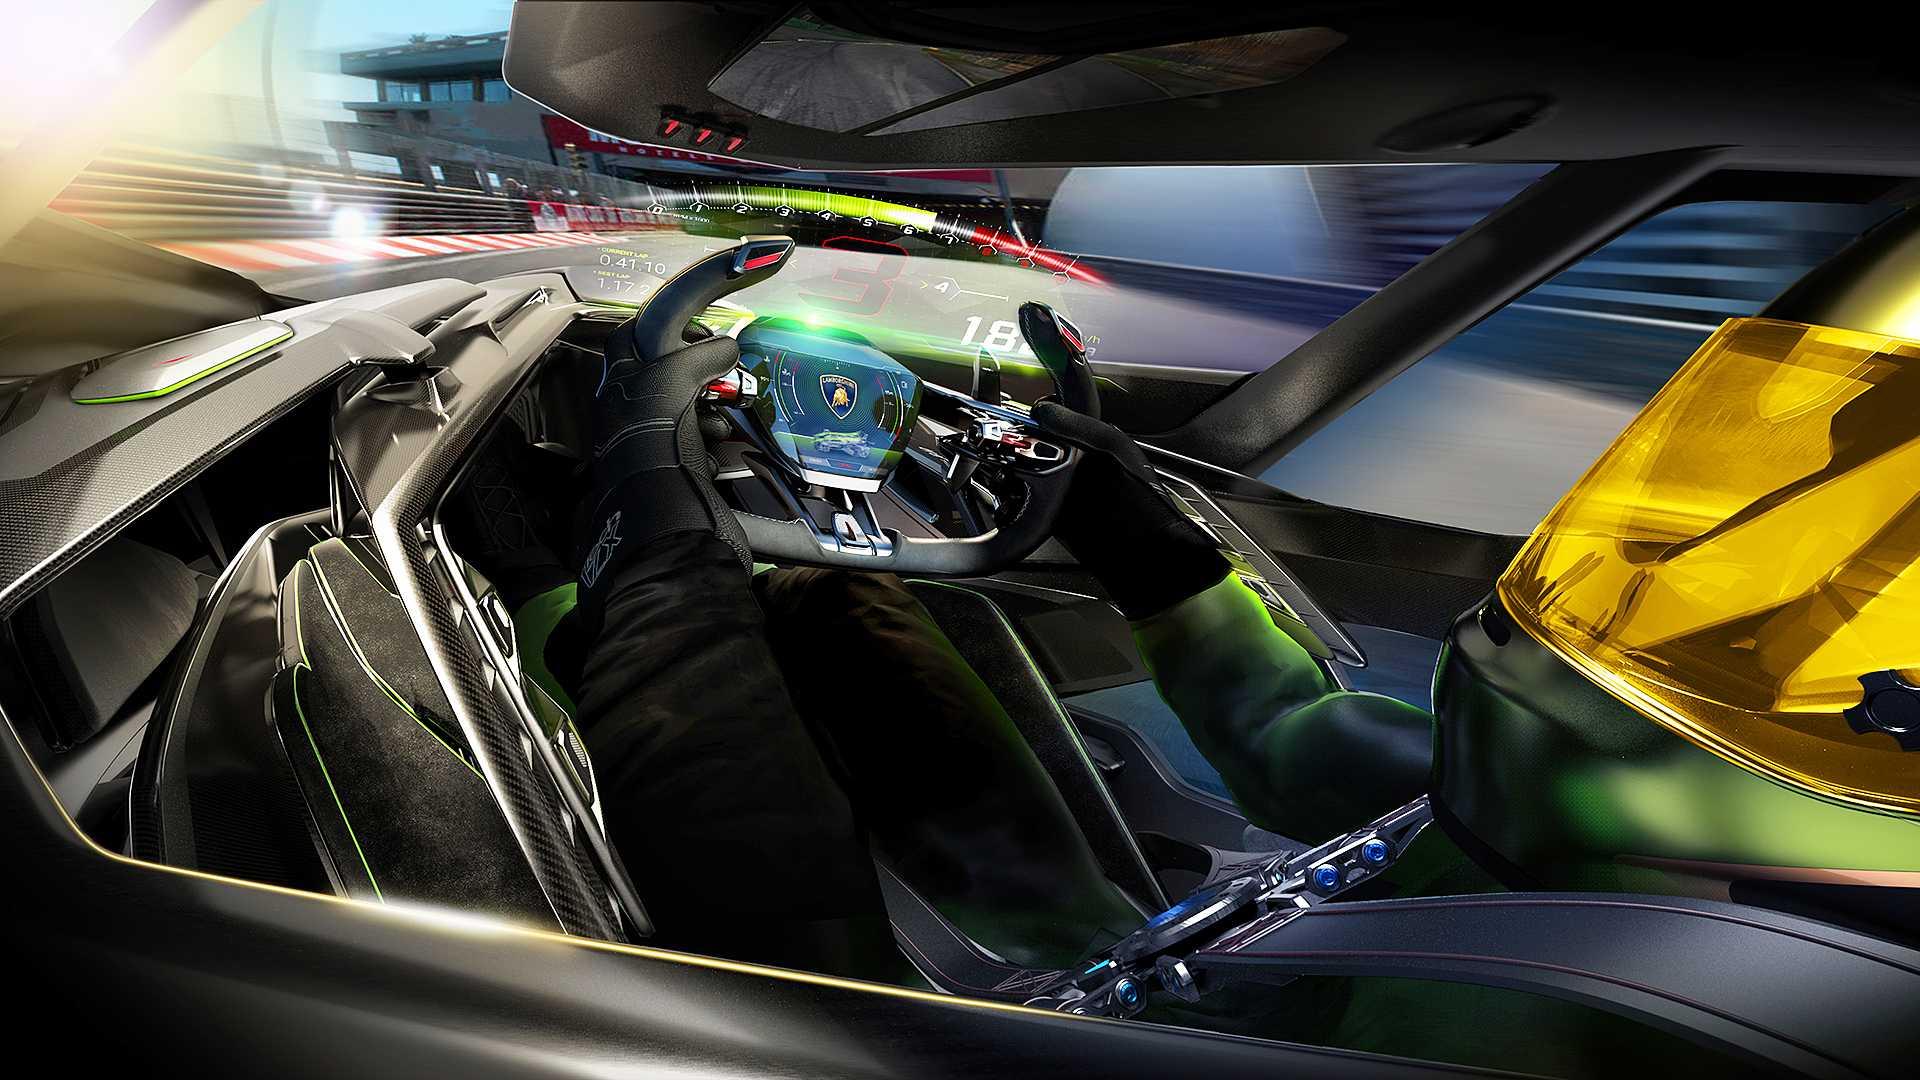 Lamborghini-V12-Vision-Gran-Turismo-3